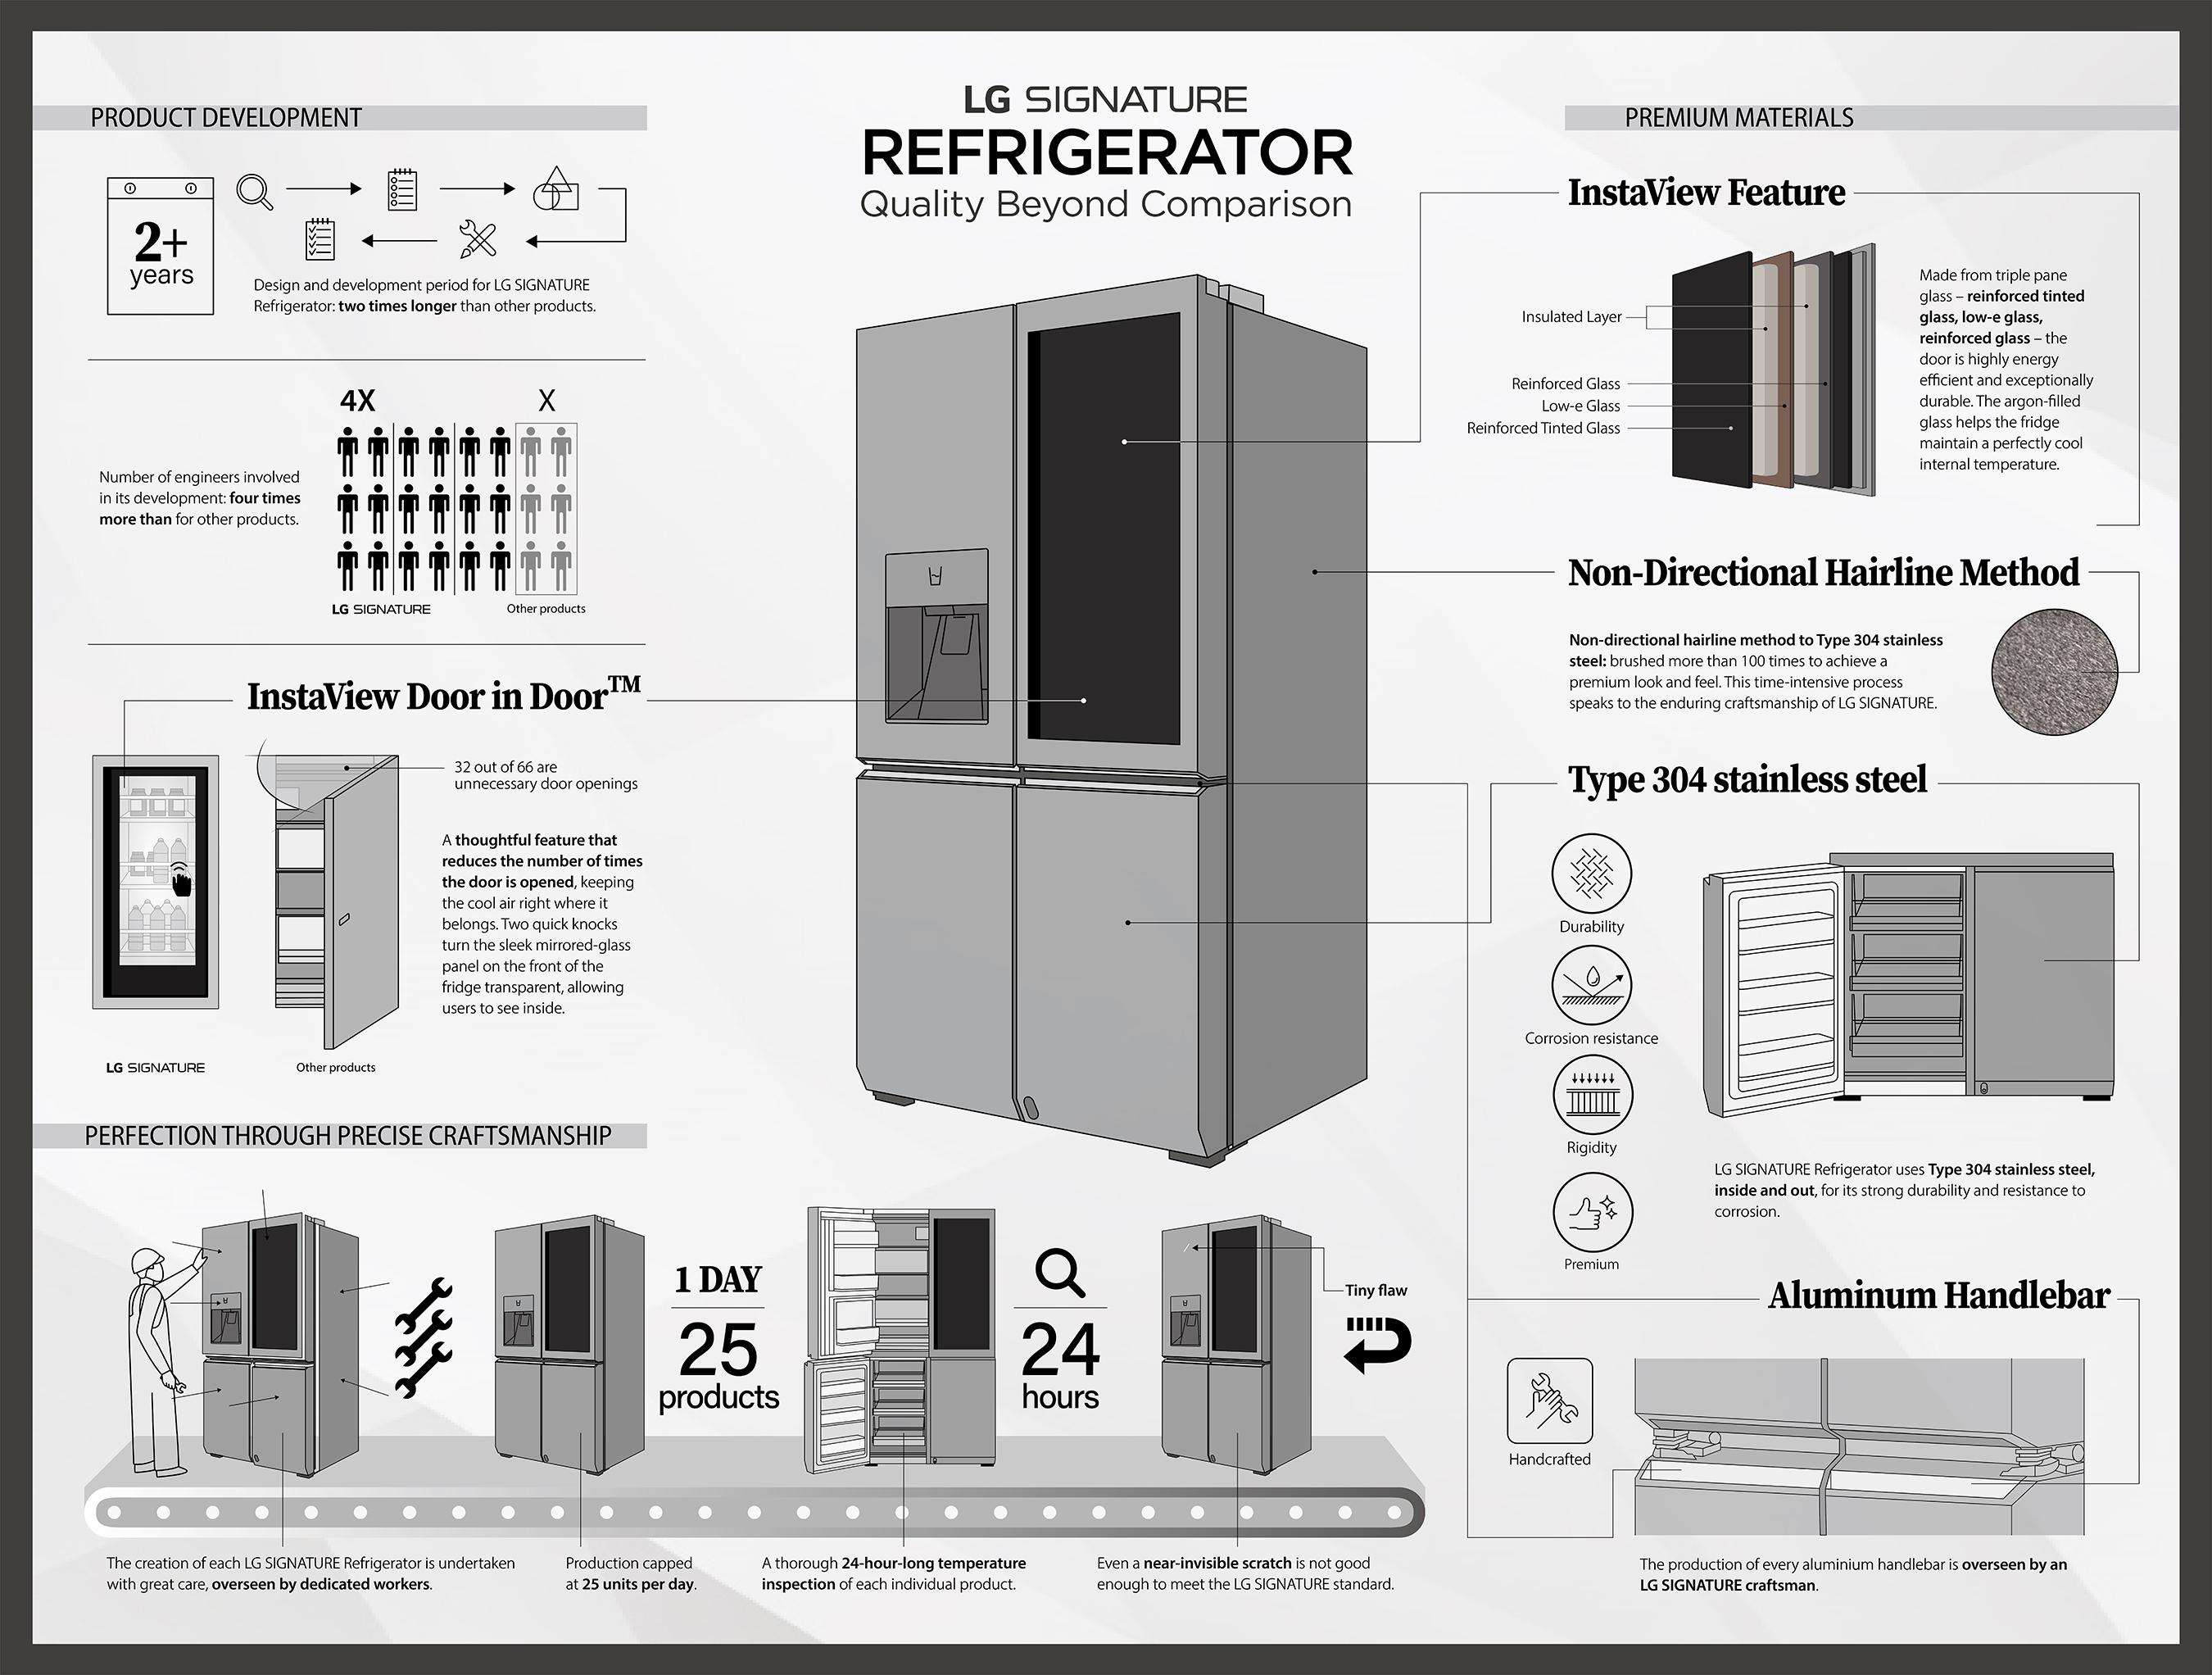 LG SIGNATURE Refrigerator boasts quality beyond comparison